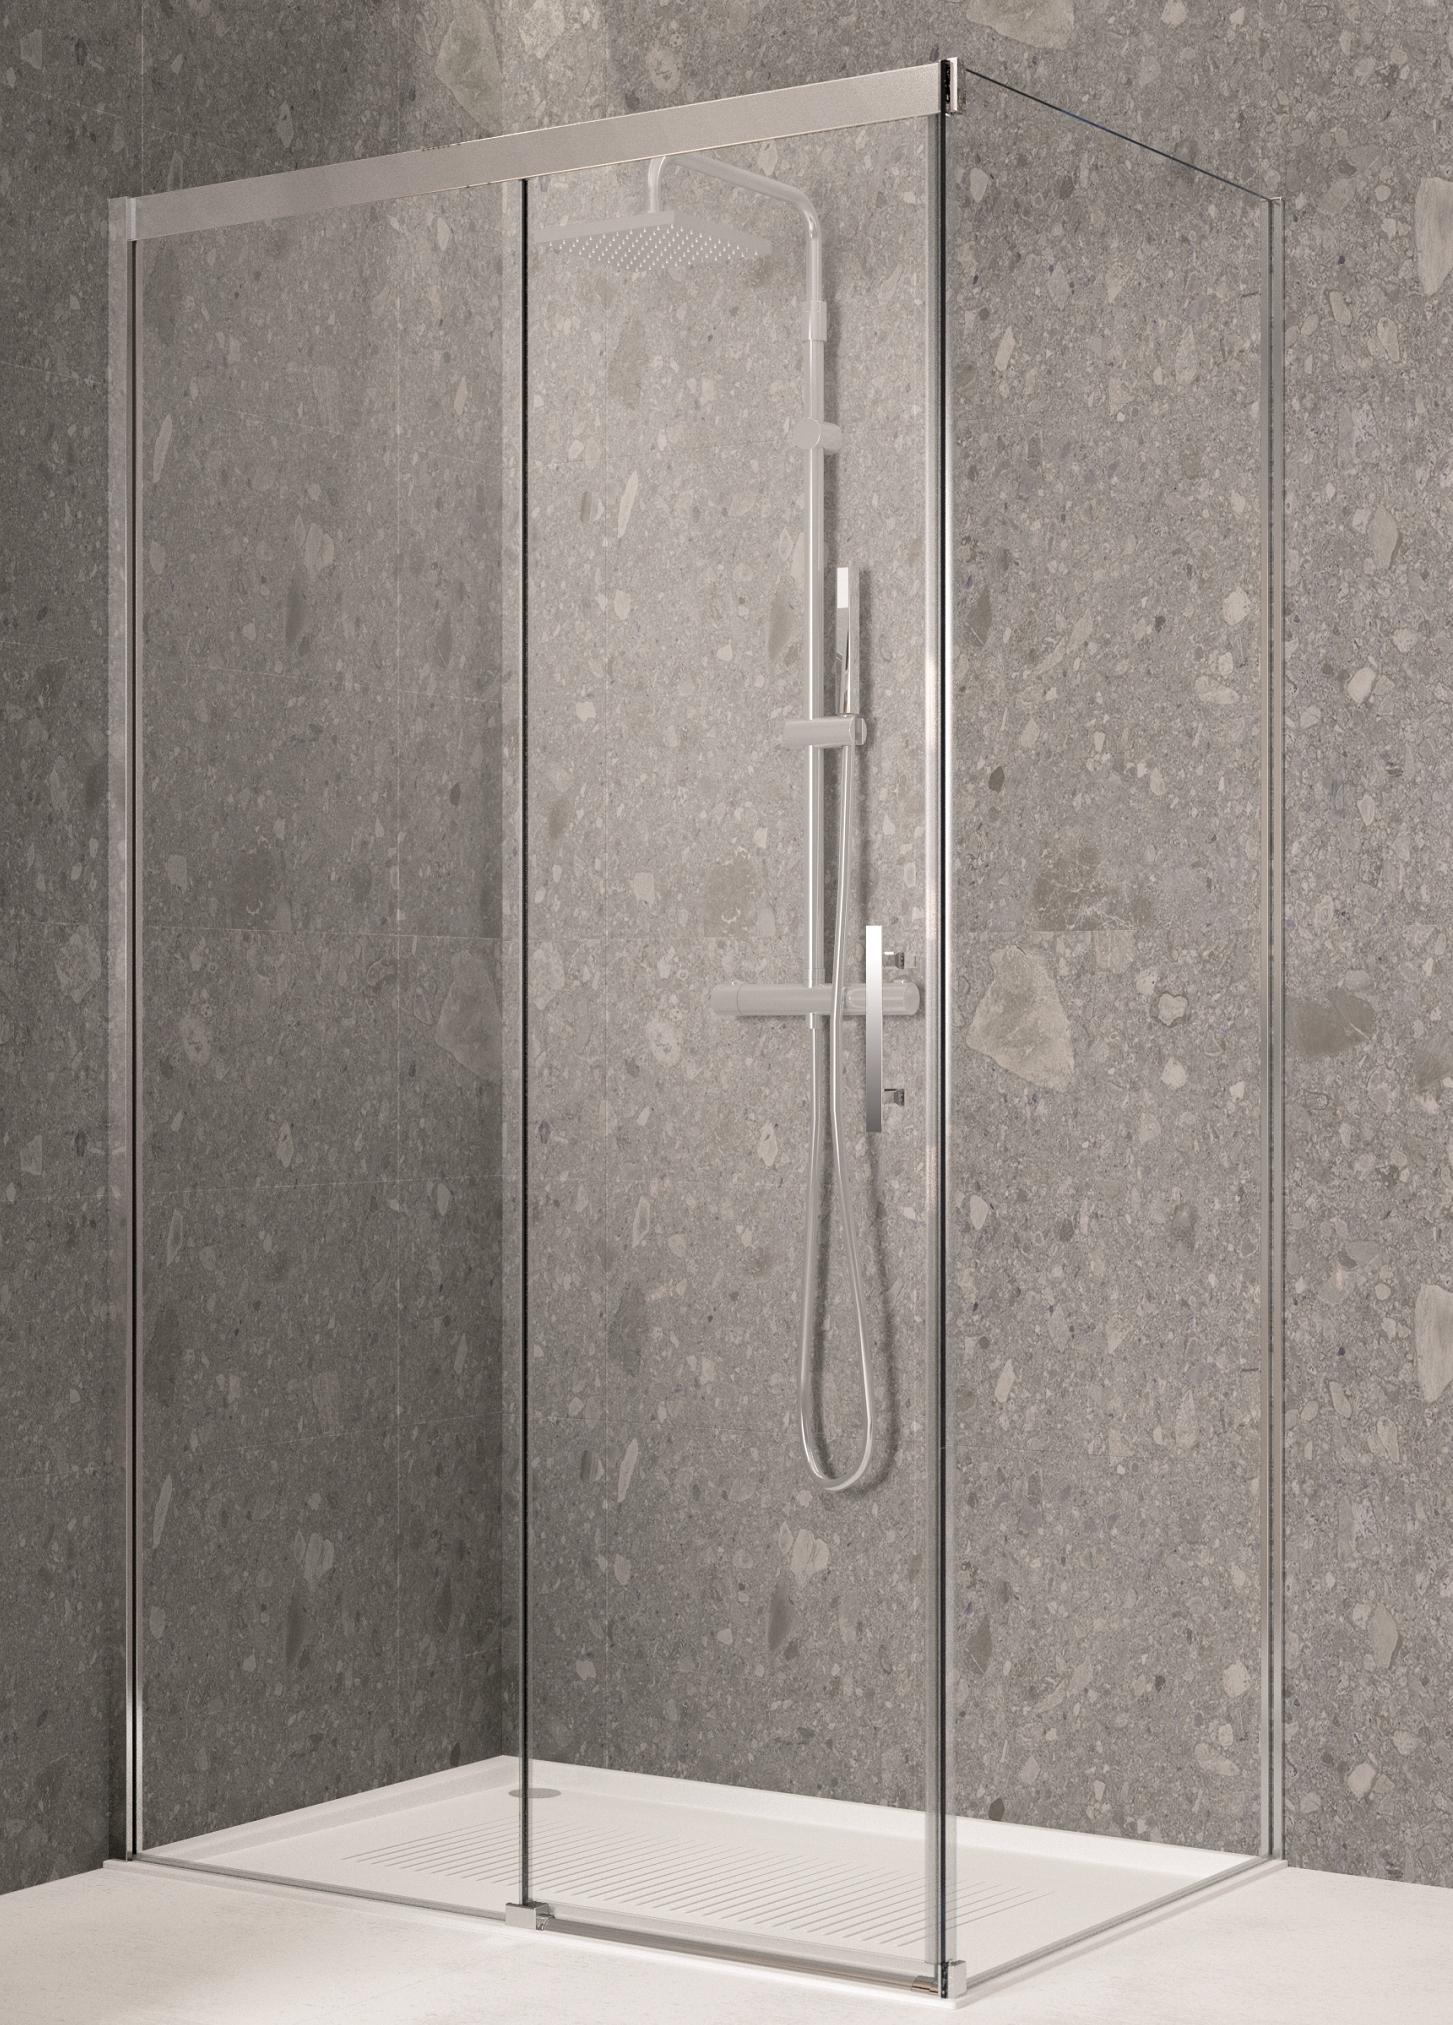 NOVELLINI sprcha KALI PH+FH 100x70 +++